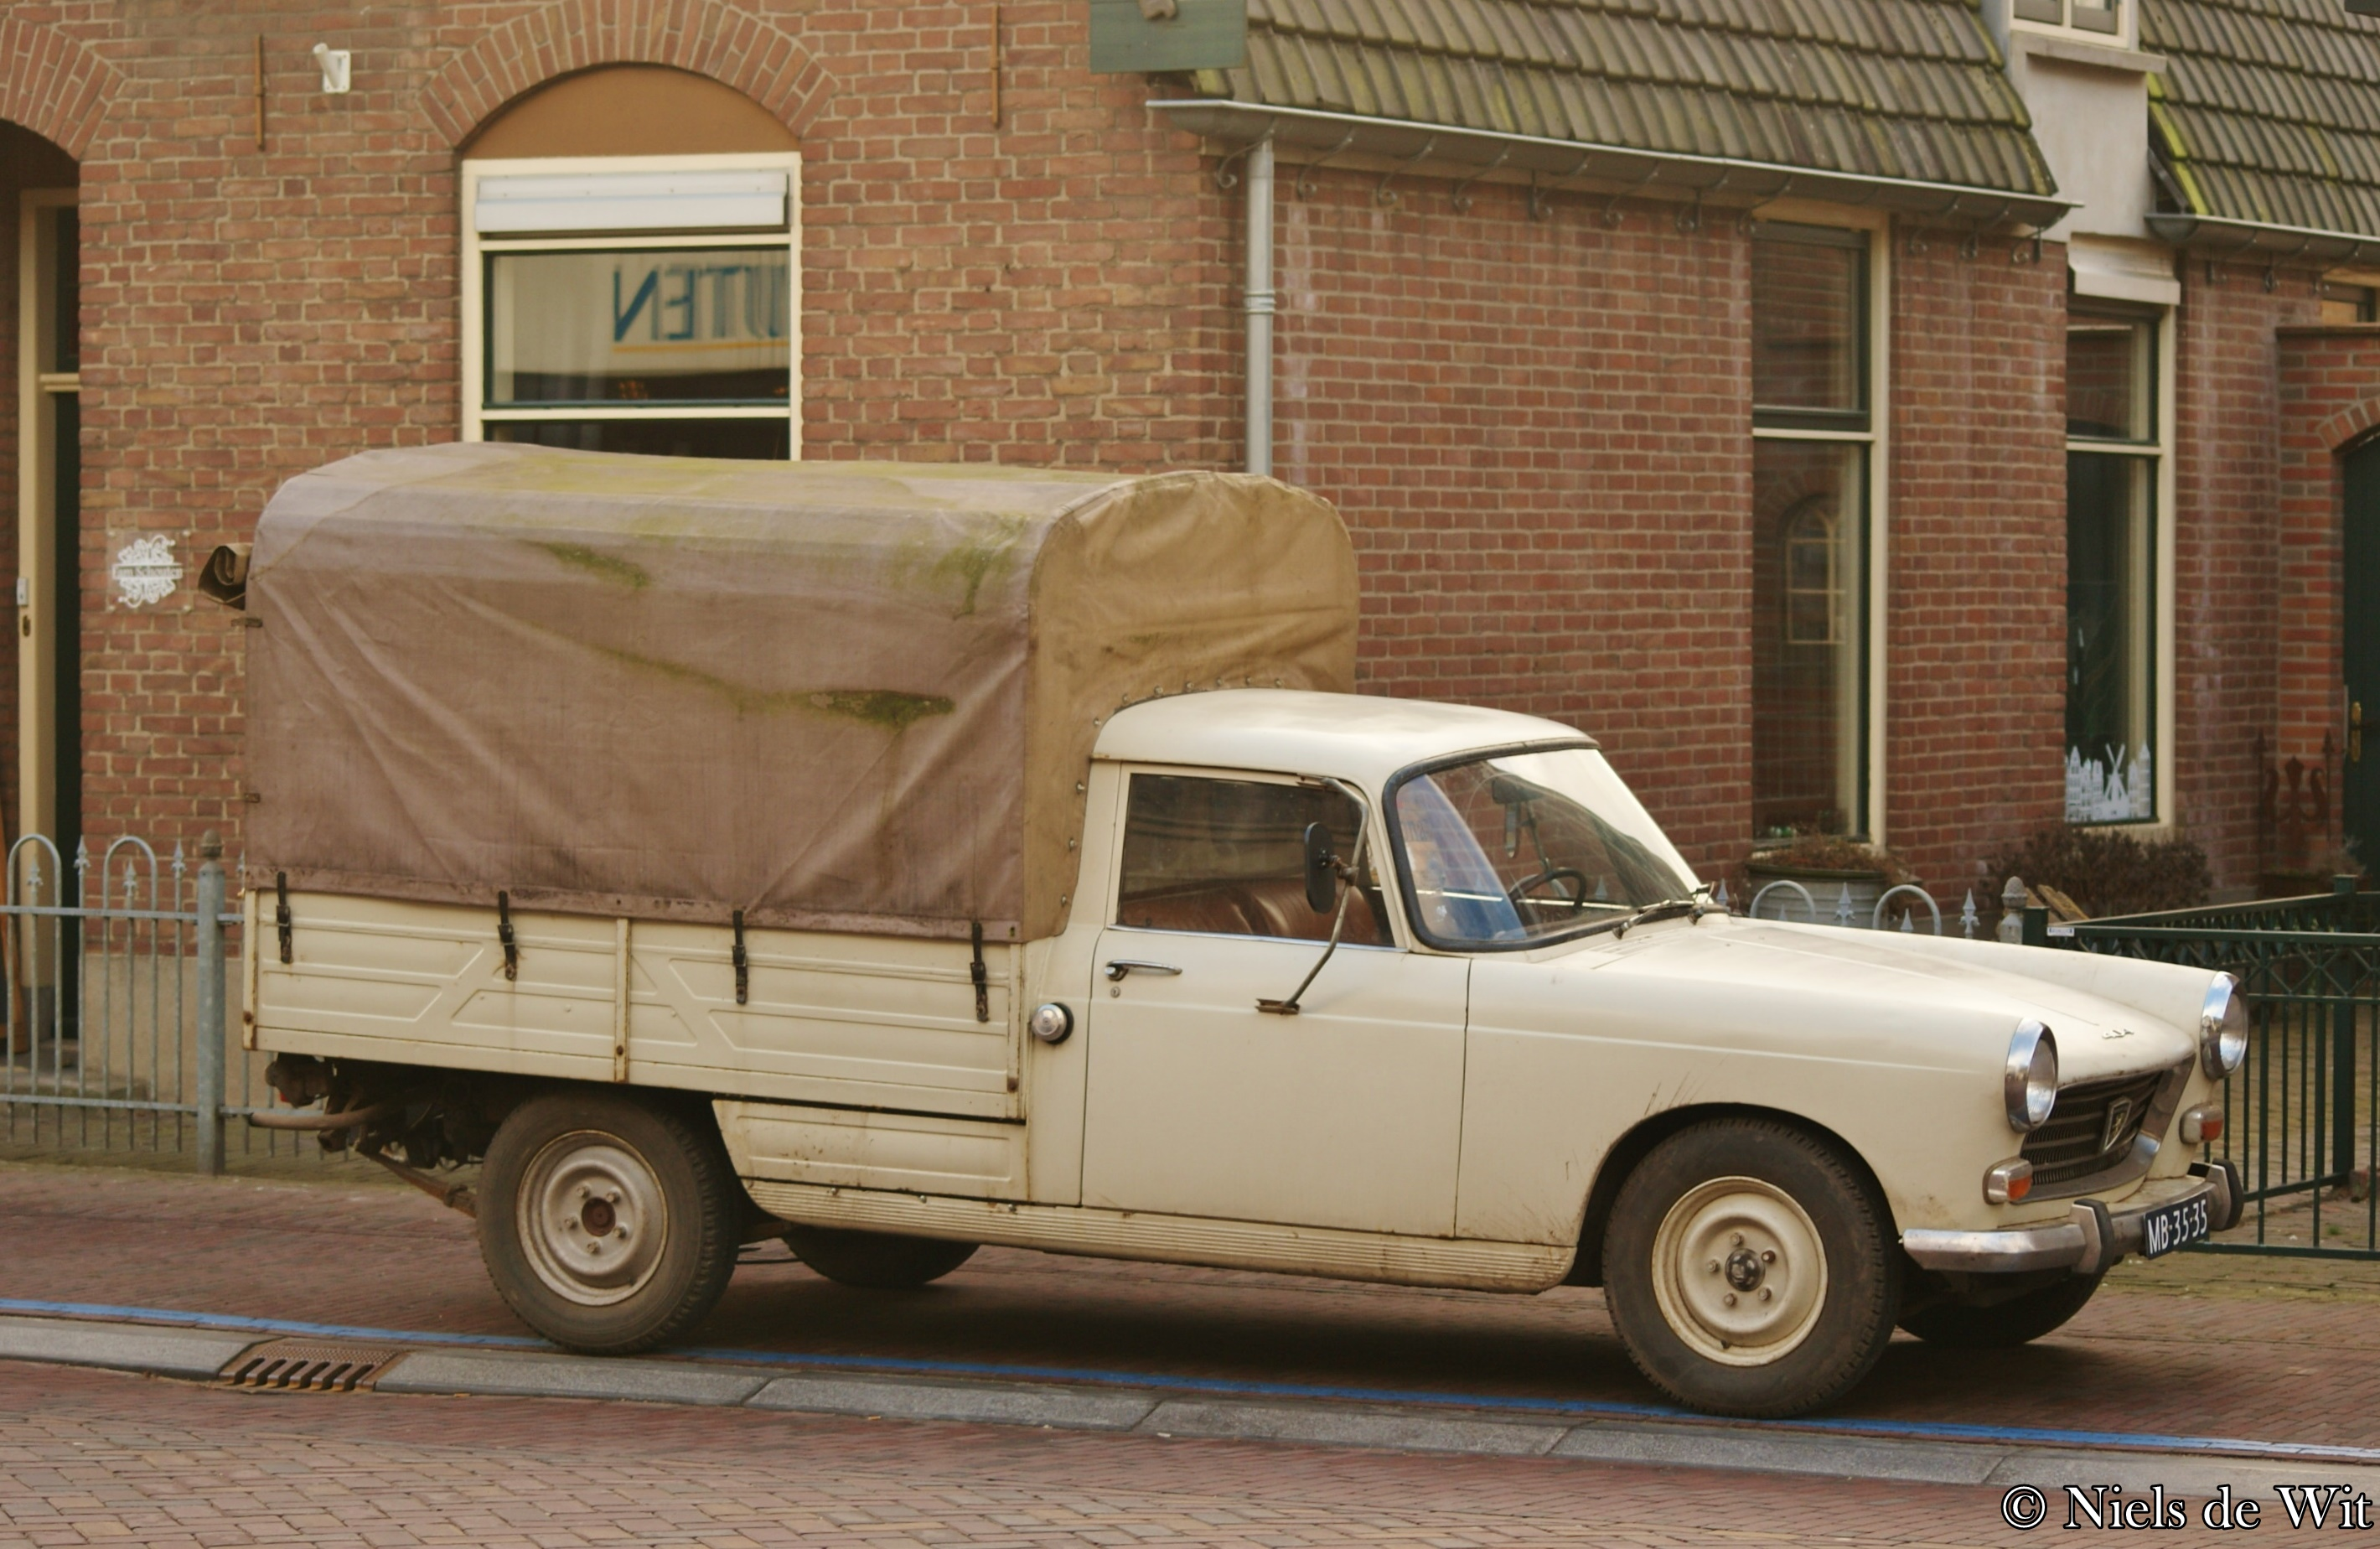 file:1974 peugeot 404 pick-up (16539254035) - wikimedia commons